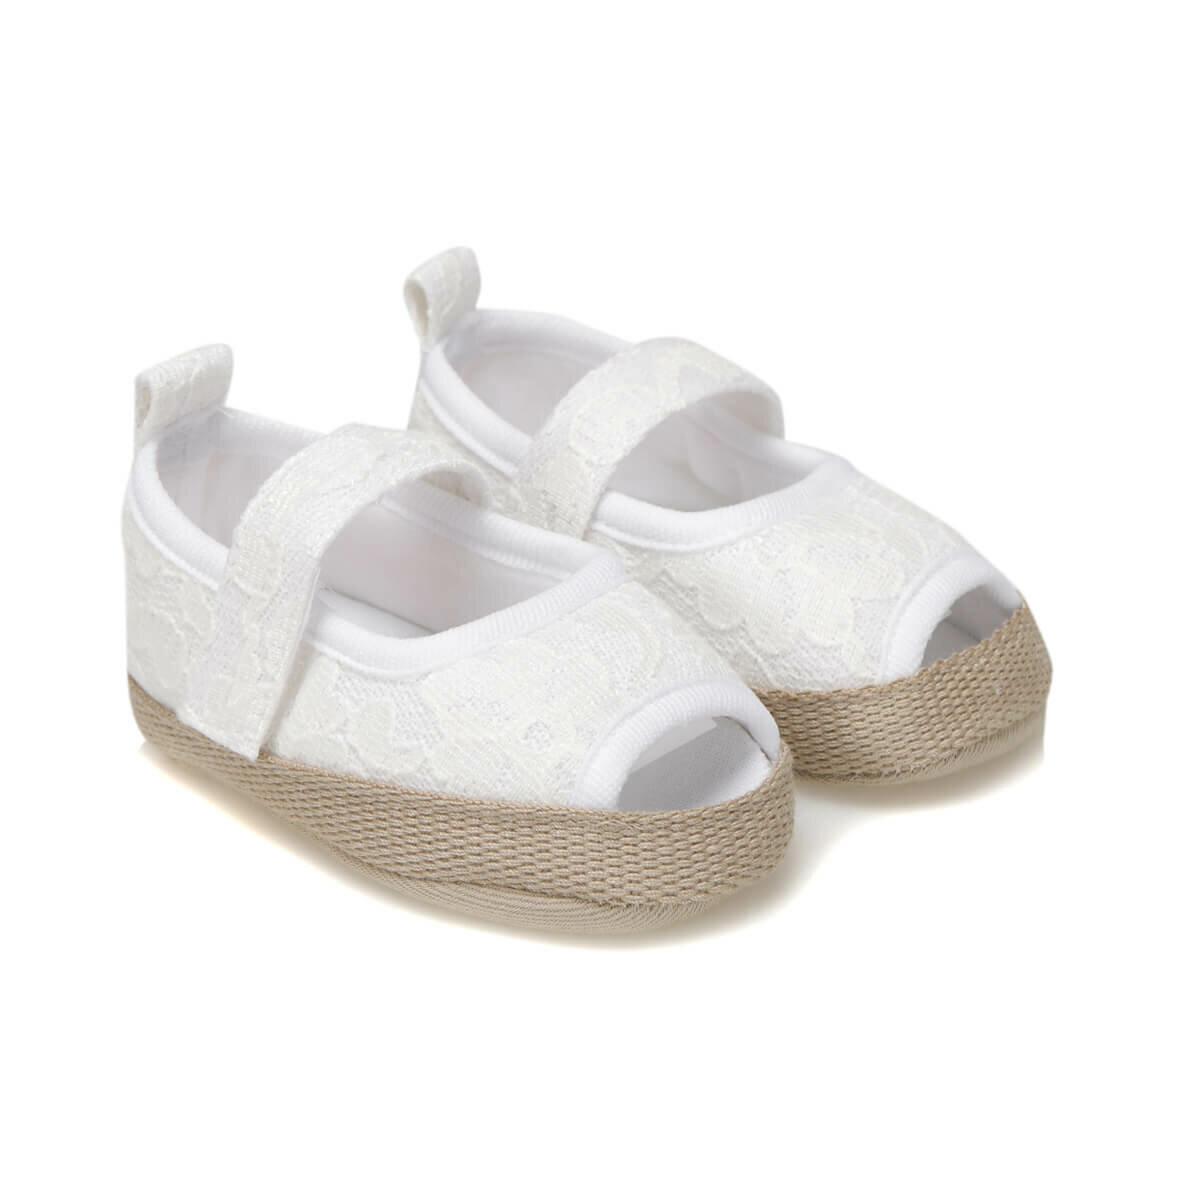 FLO MIST White Male Child Sandals KINETIX